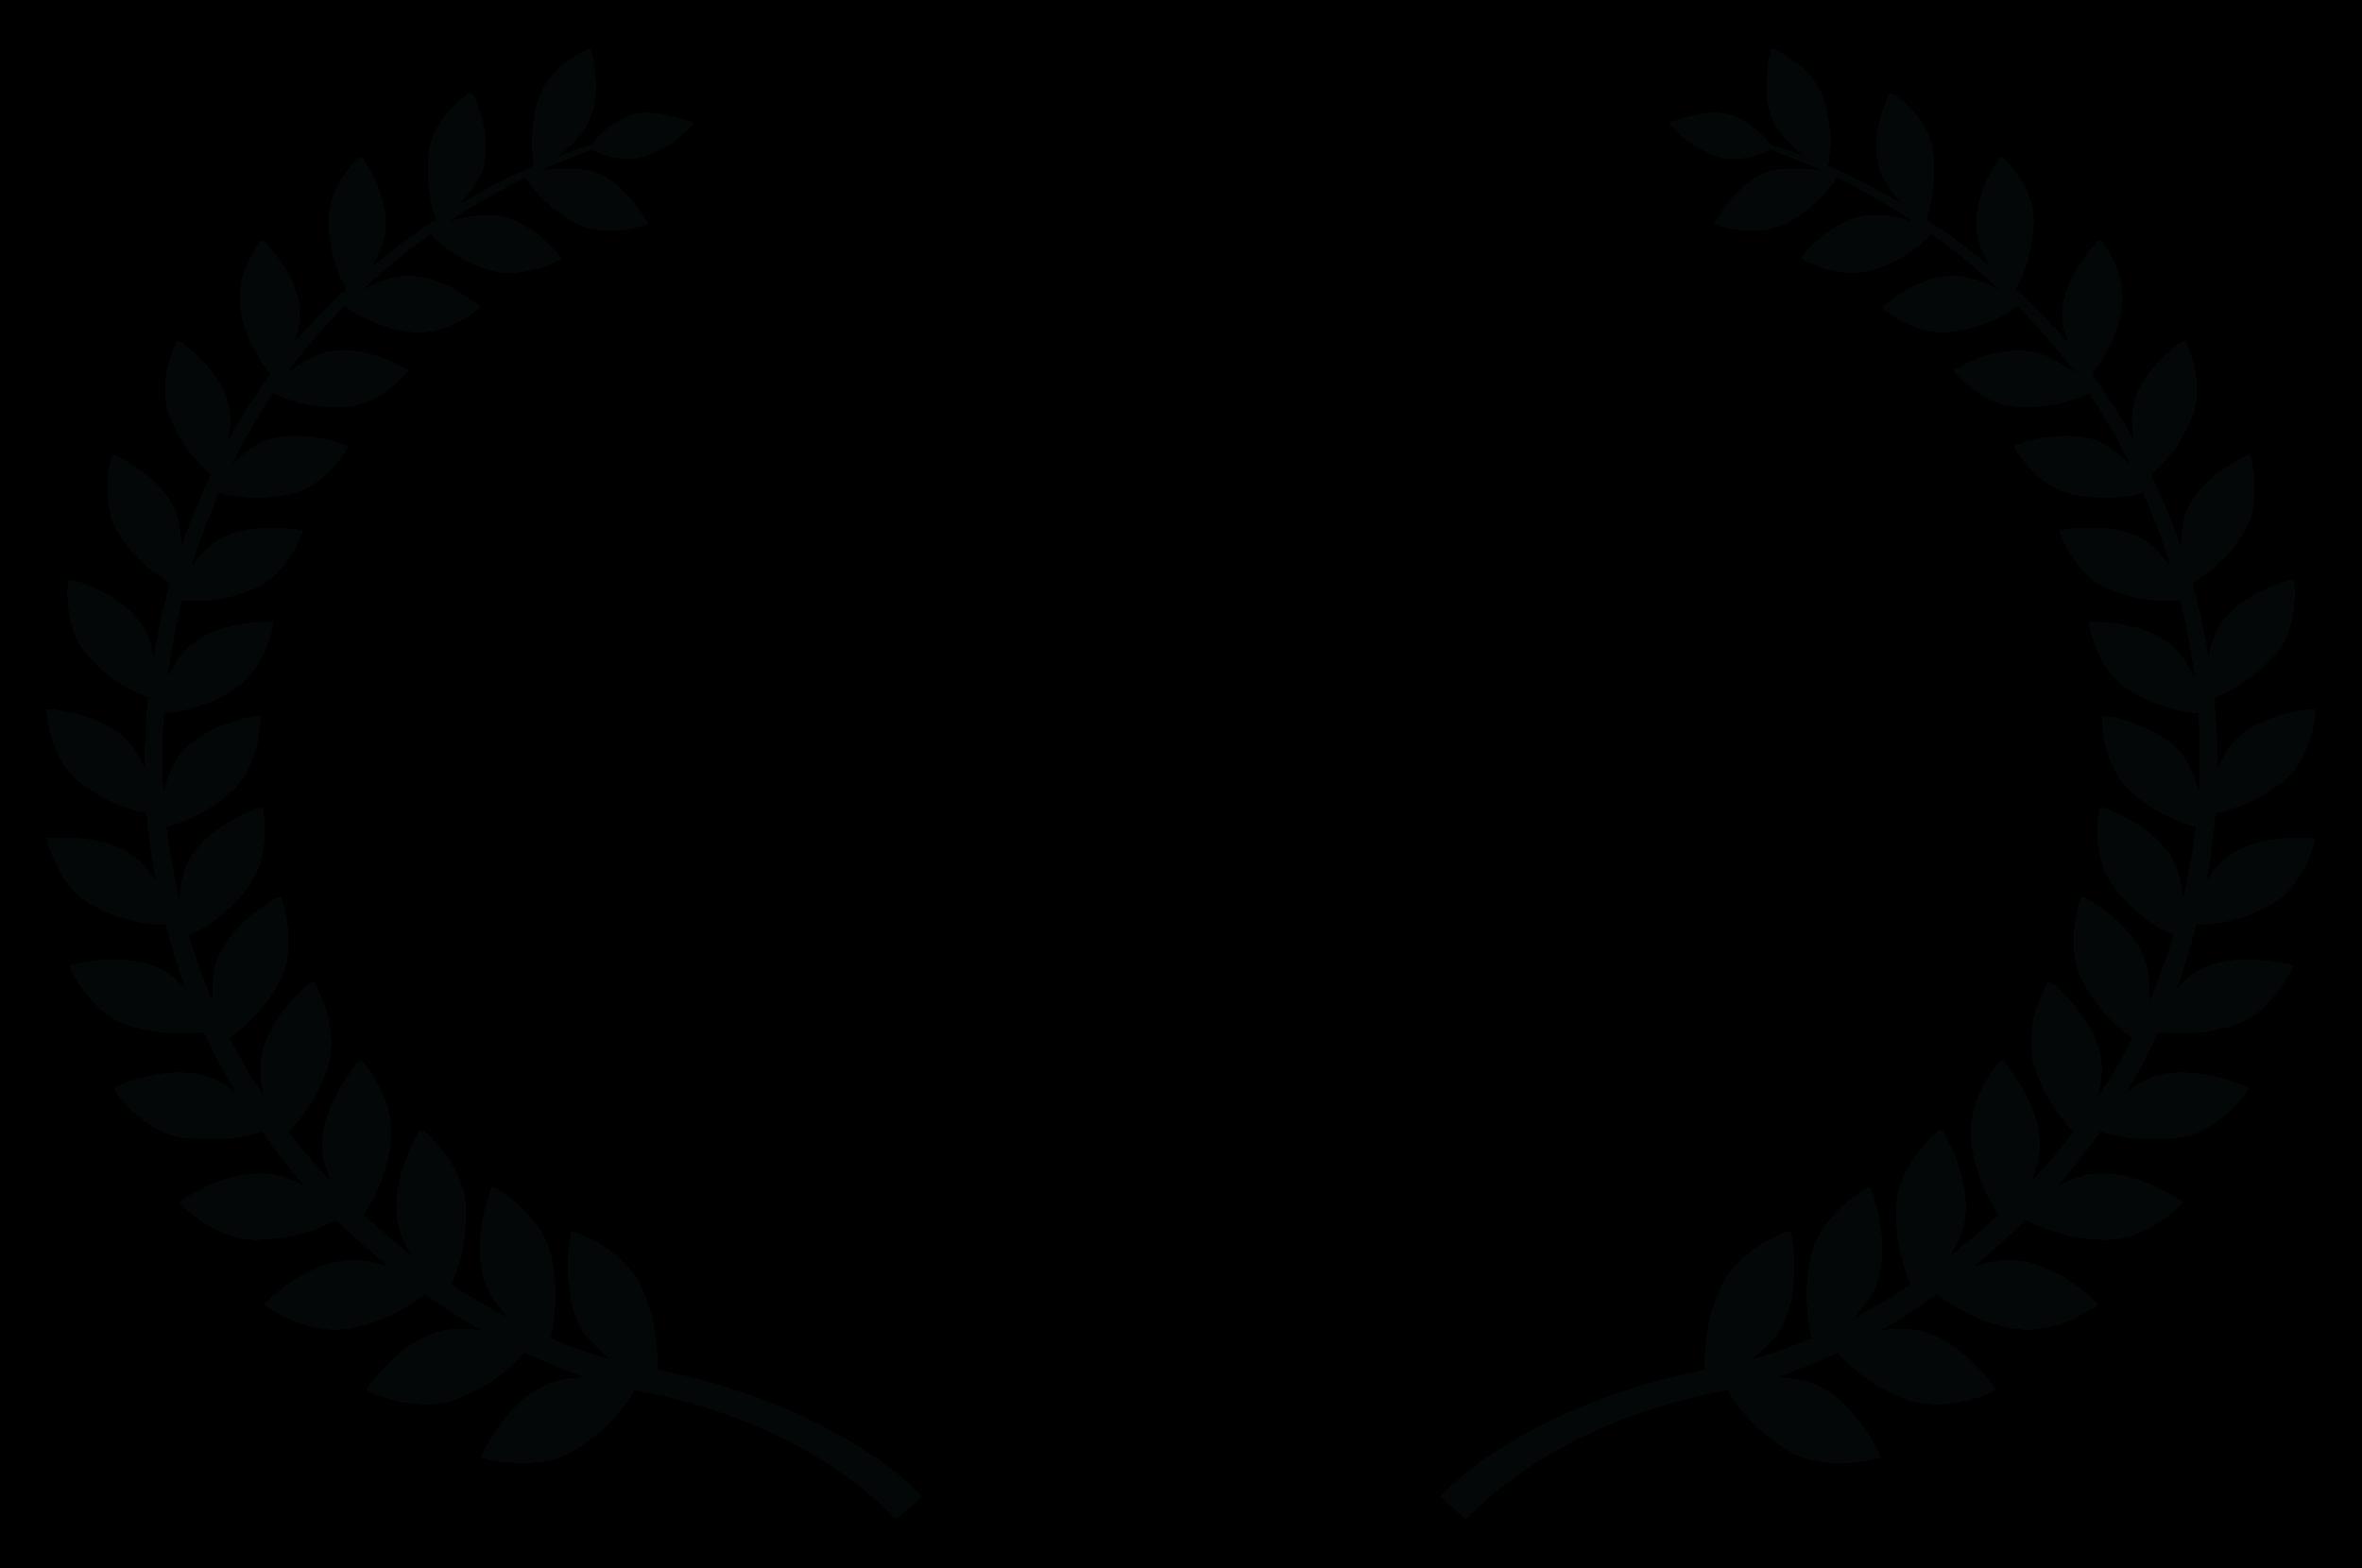 OFFICIALSELECTION-BigAppleFilmFestival-2019winteredition.png